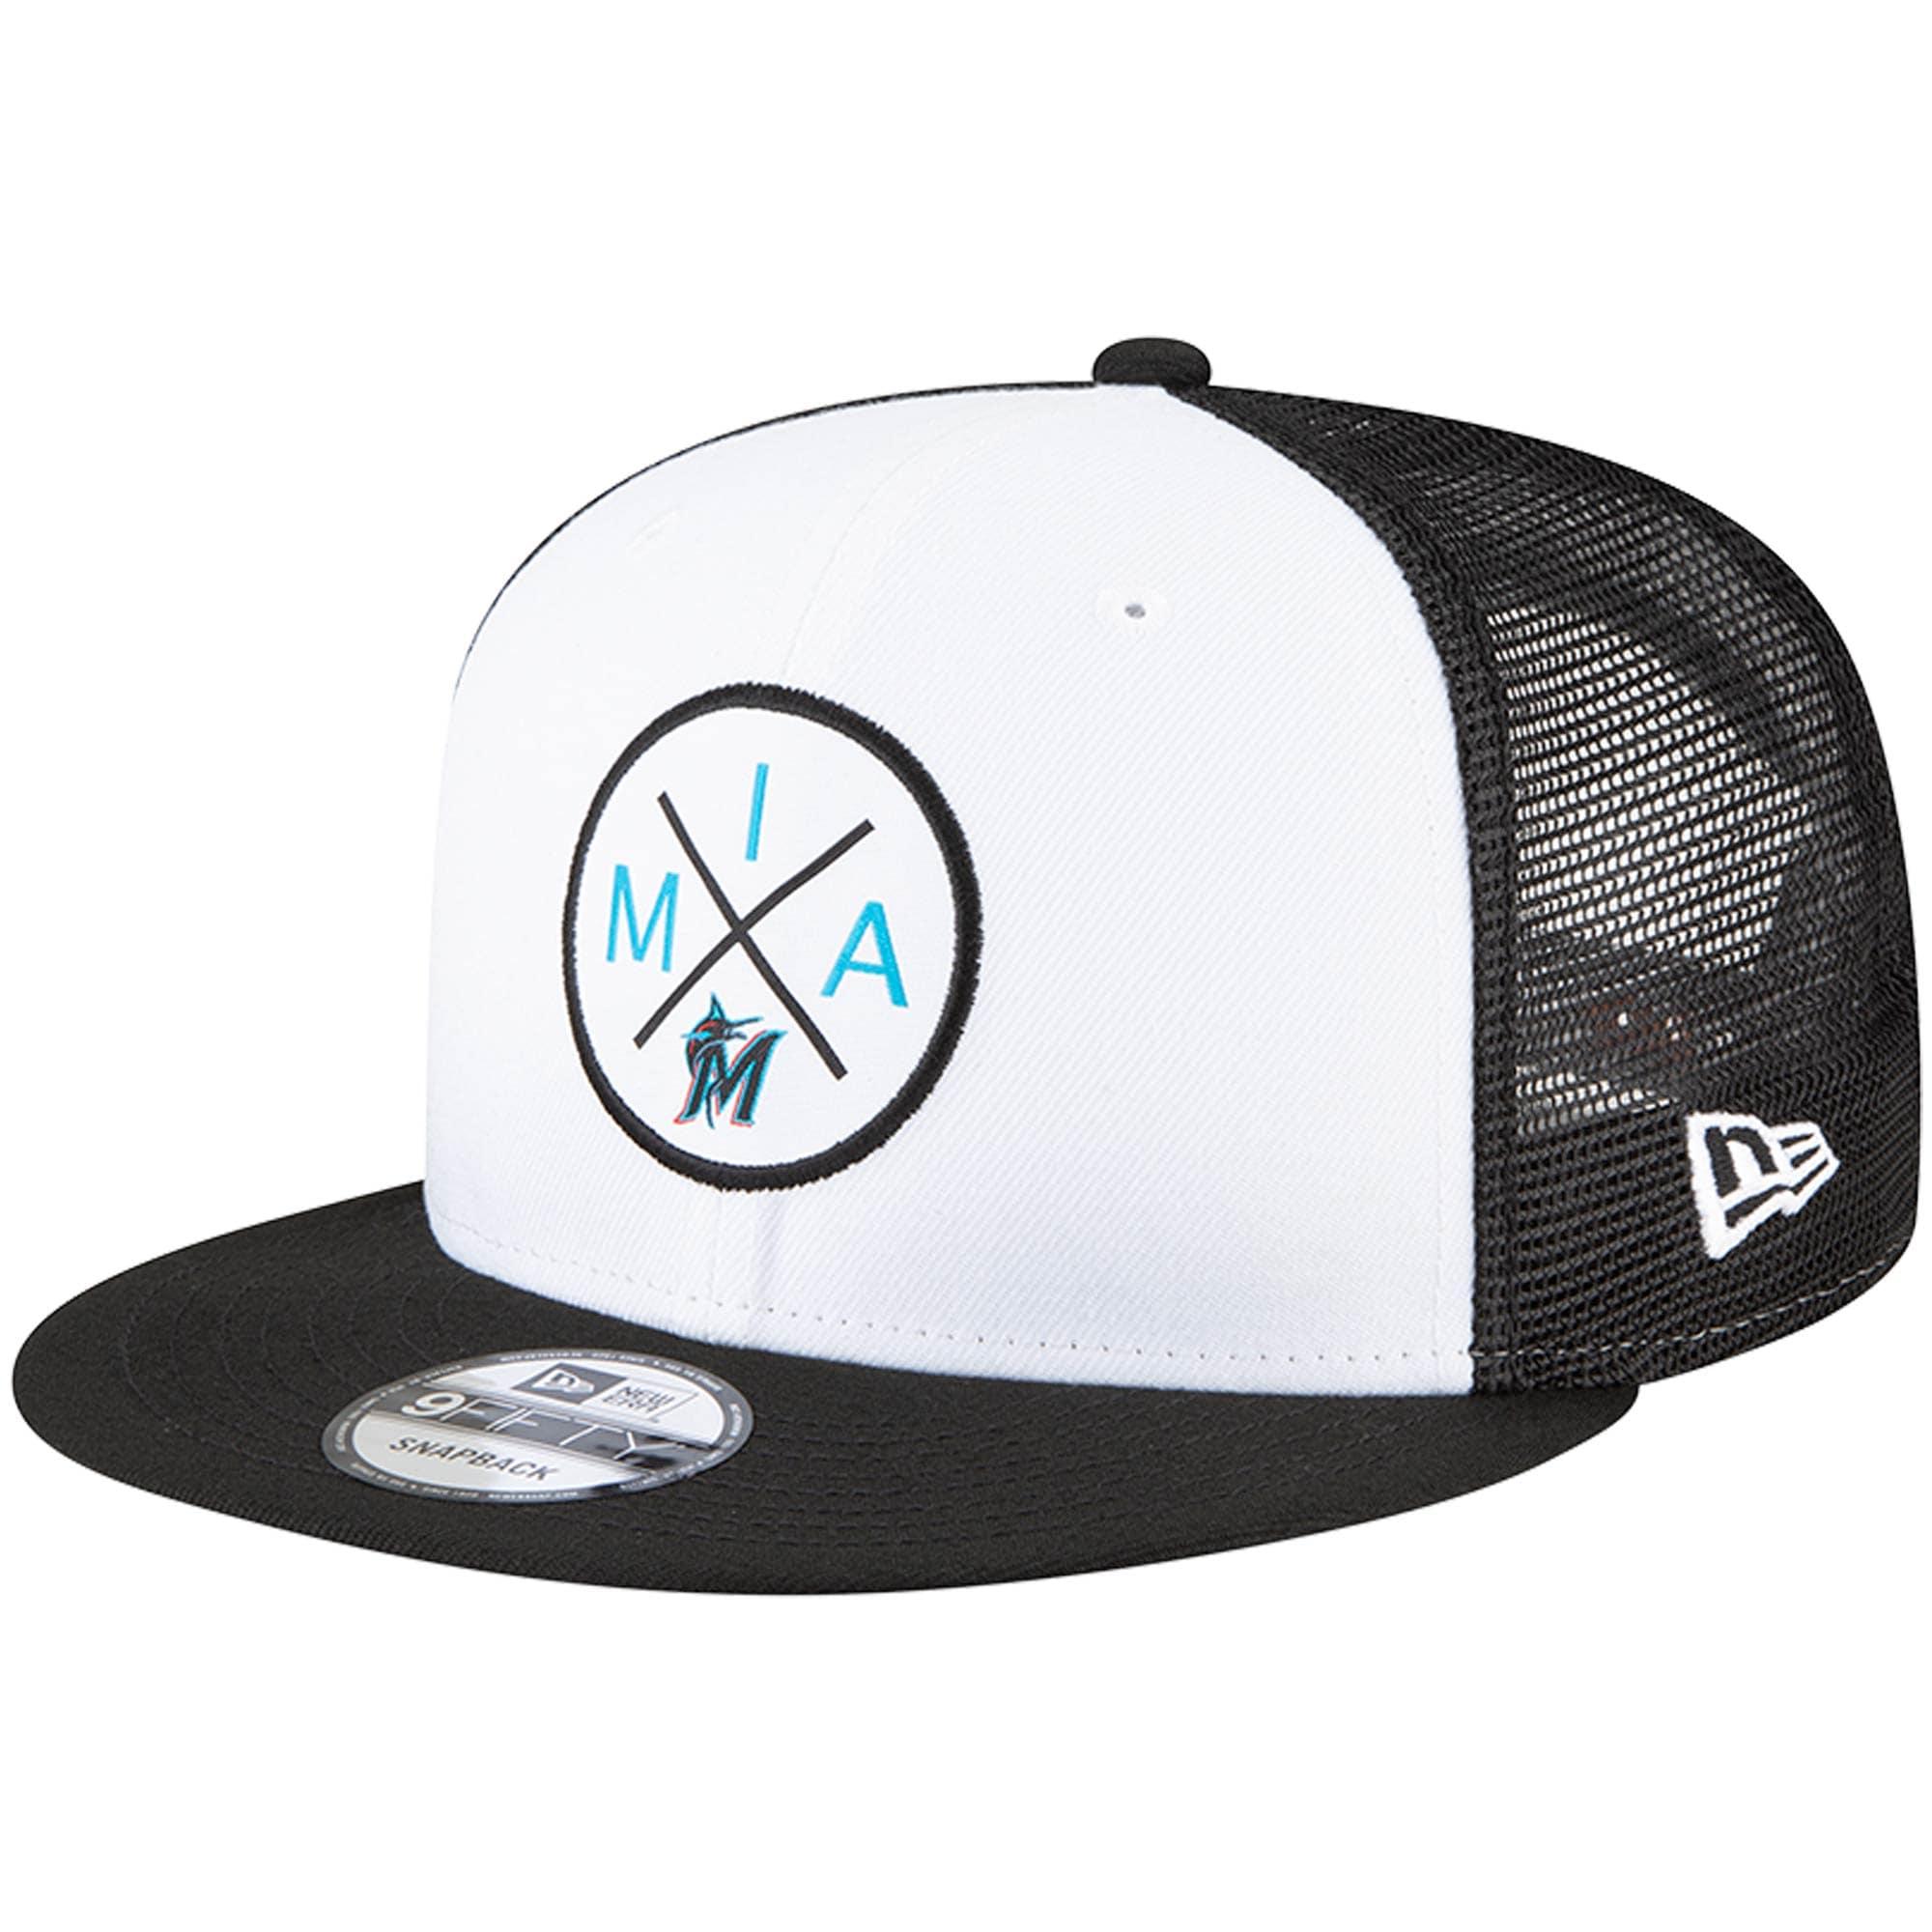 Miami Marlins New Era Vert 2.0 9FIFTY Trucker Snapback Hat - White/Black